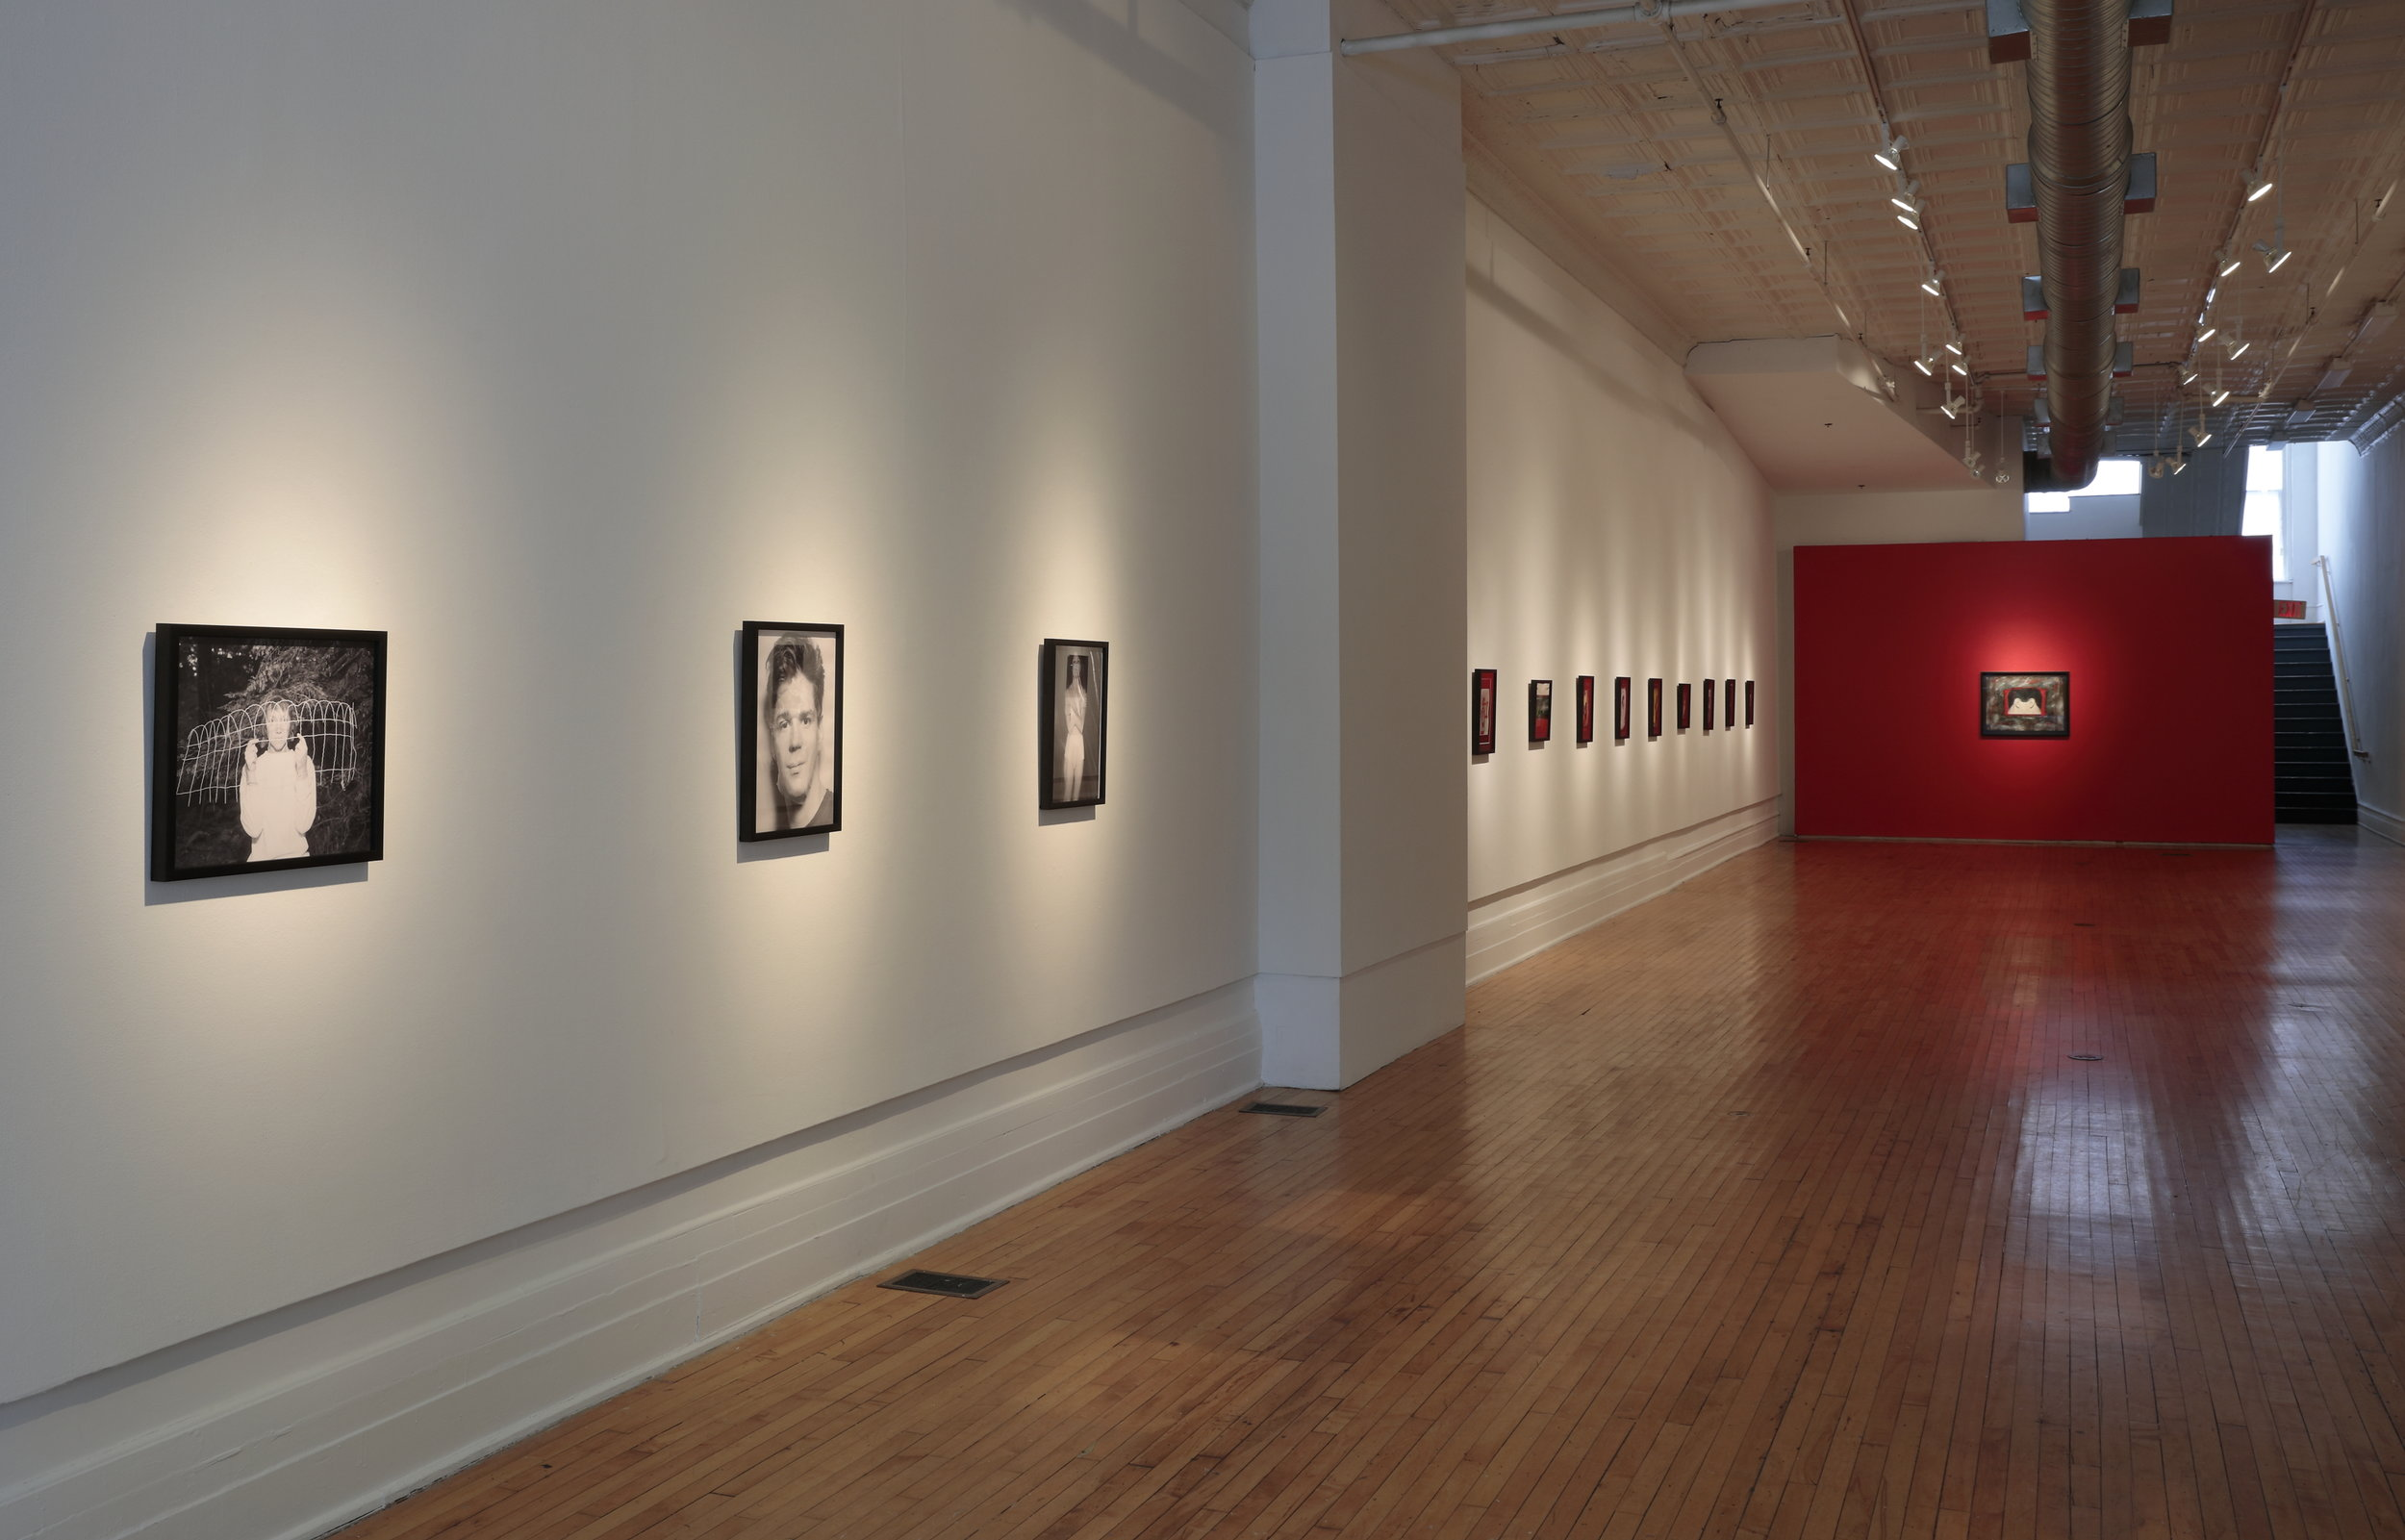 Cindy Neuschwander,   What were you after then? What are you after now? Cindy Neuschwander: 1984 - 1990  (installation shot), 2019  Photo by David Hunter Hale